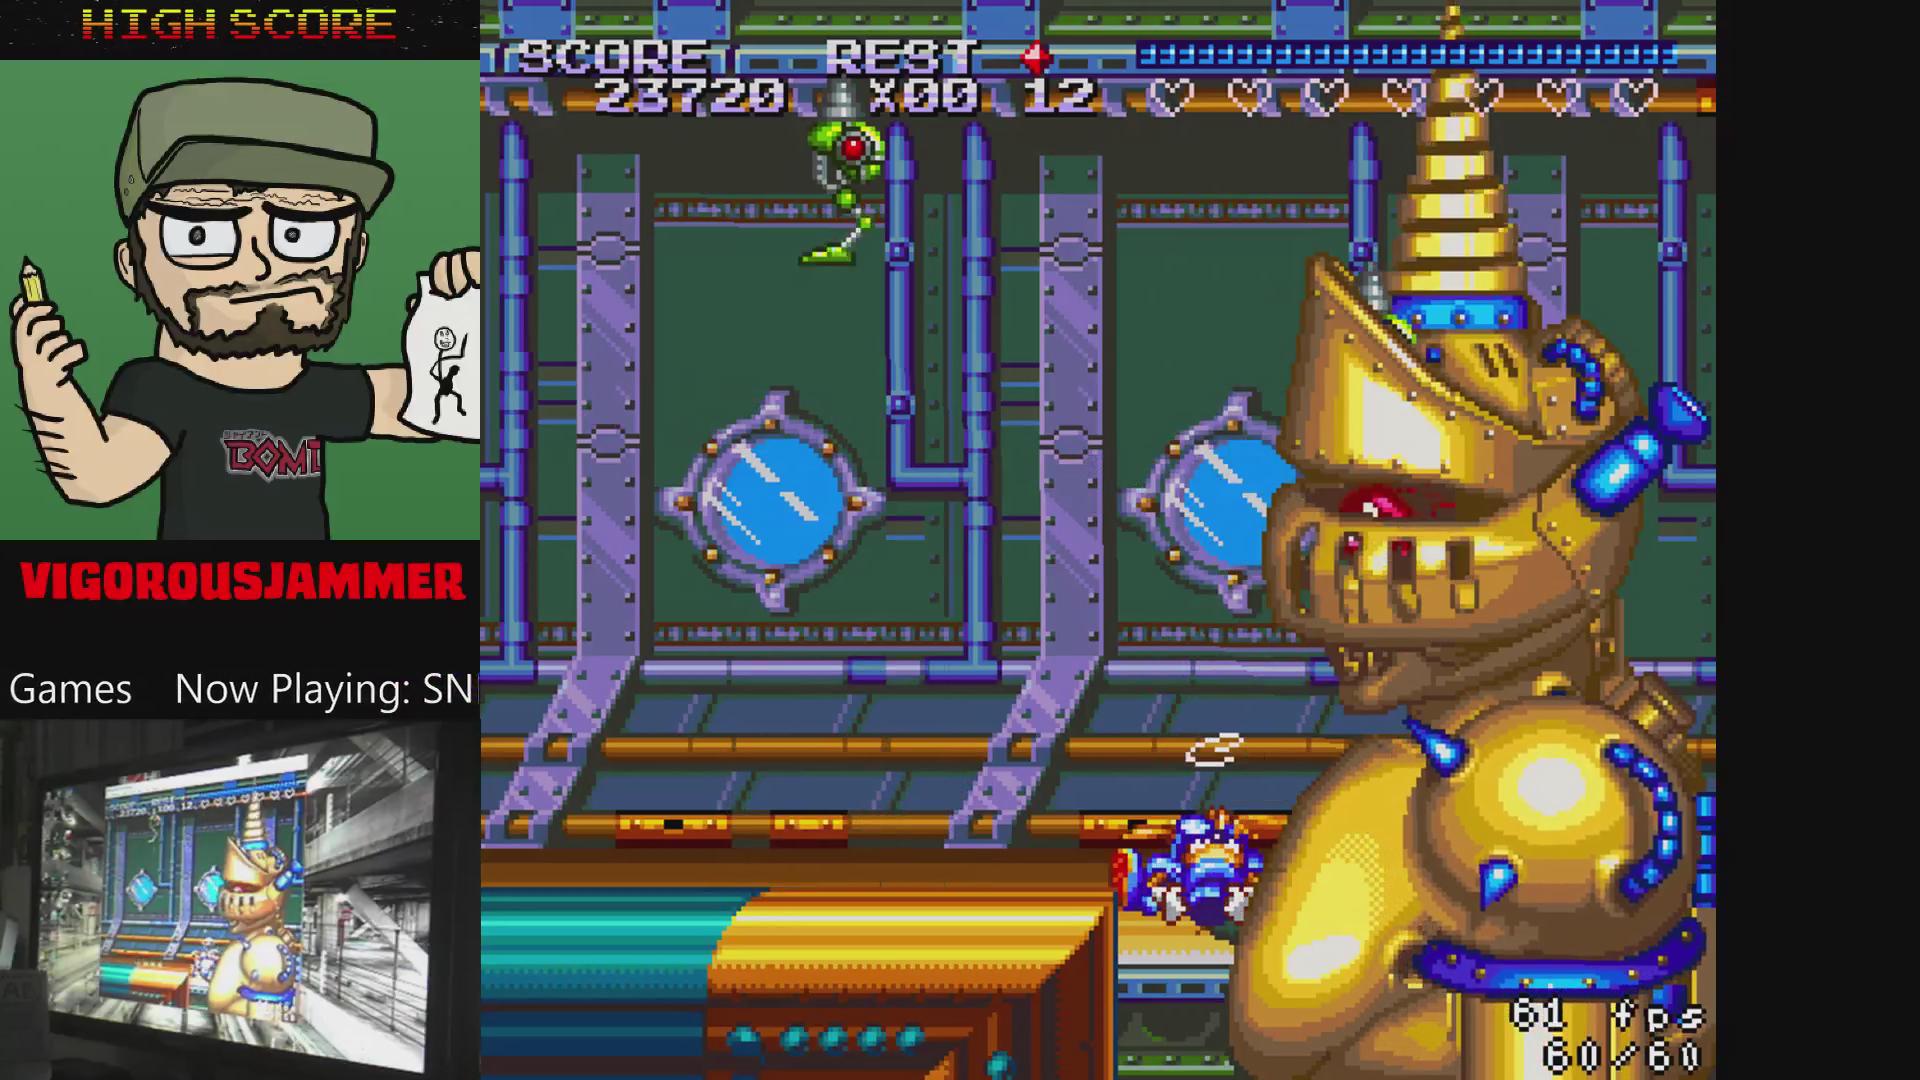 vigorousjammer: Sparkster (SNES/Super Famicom Emulated) 23,720 points on 2015-08-31 00:33:48